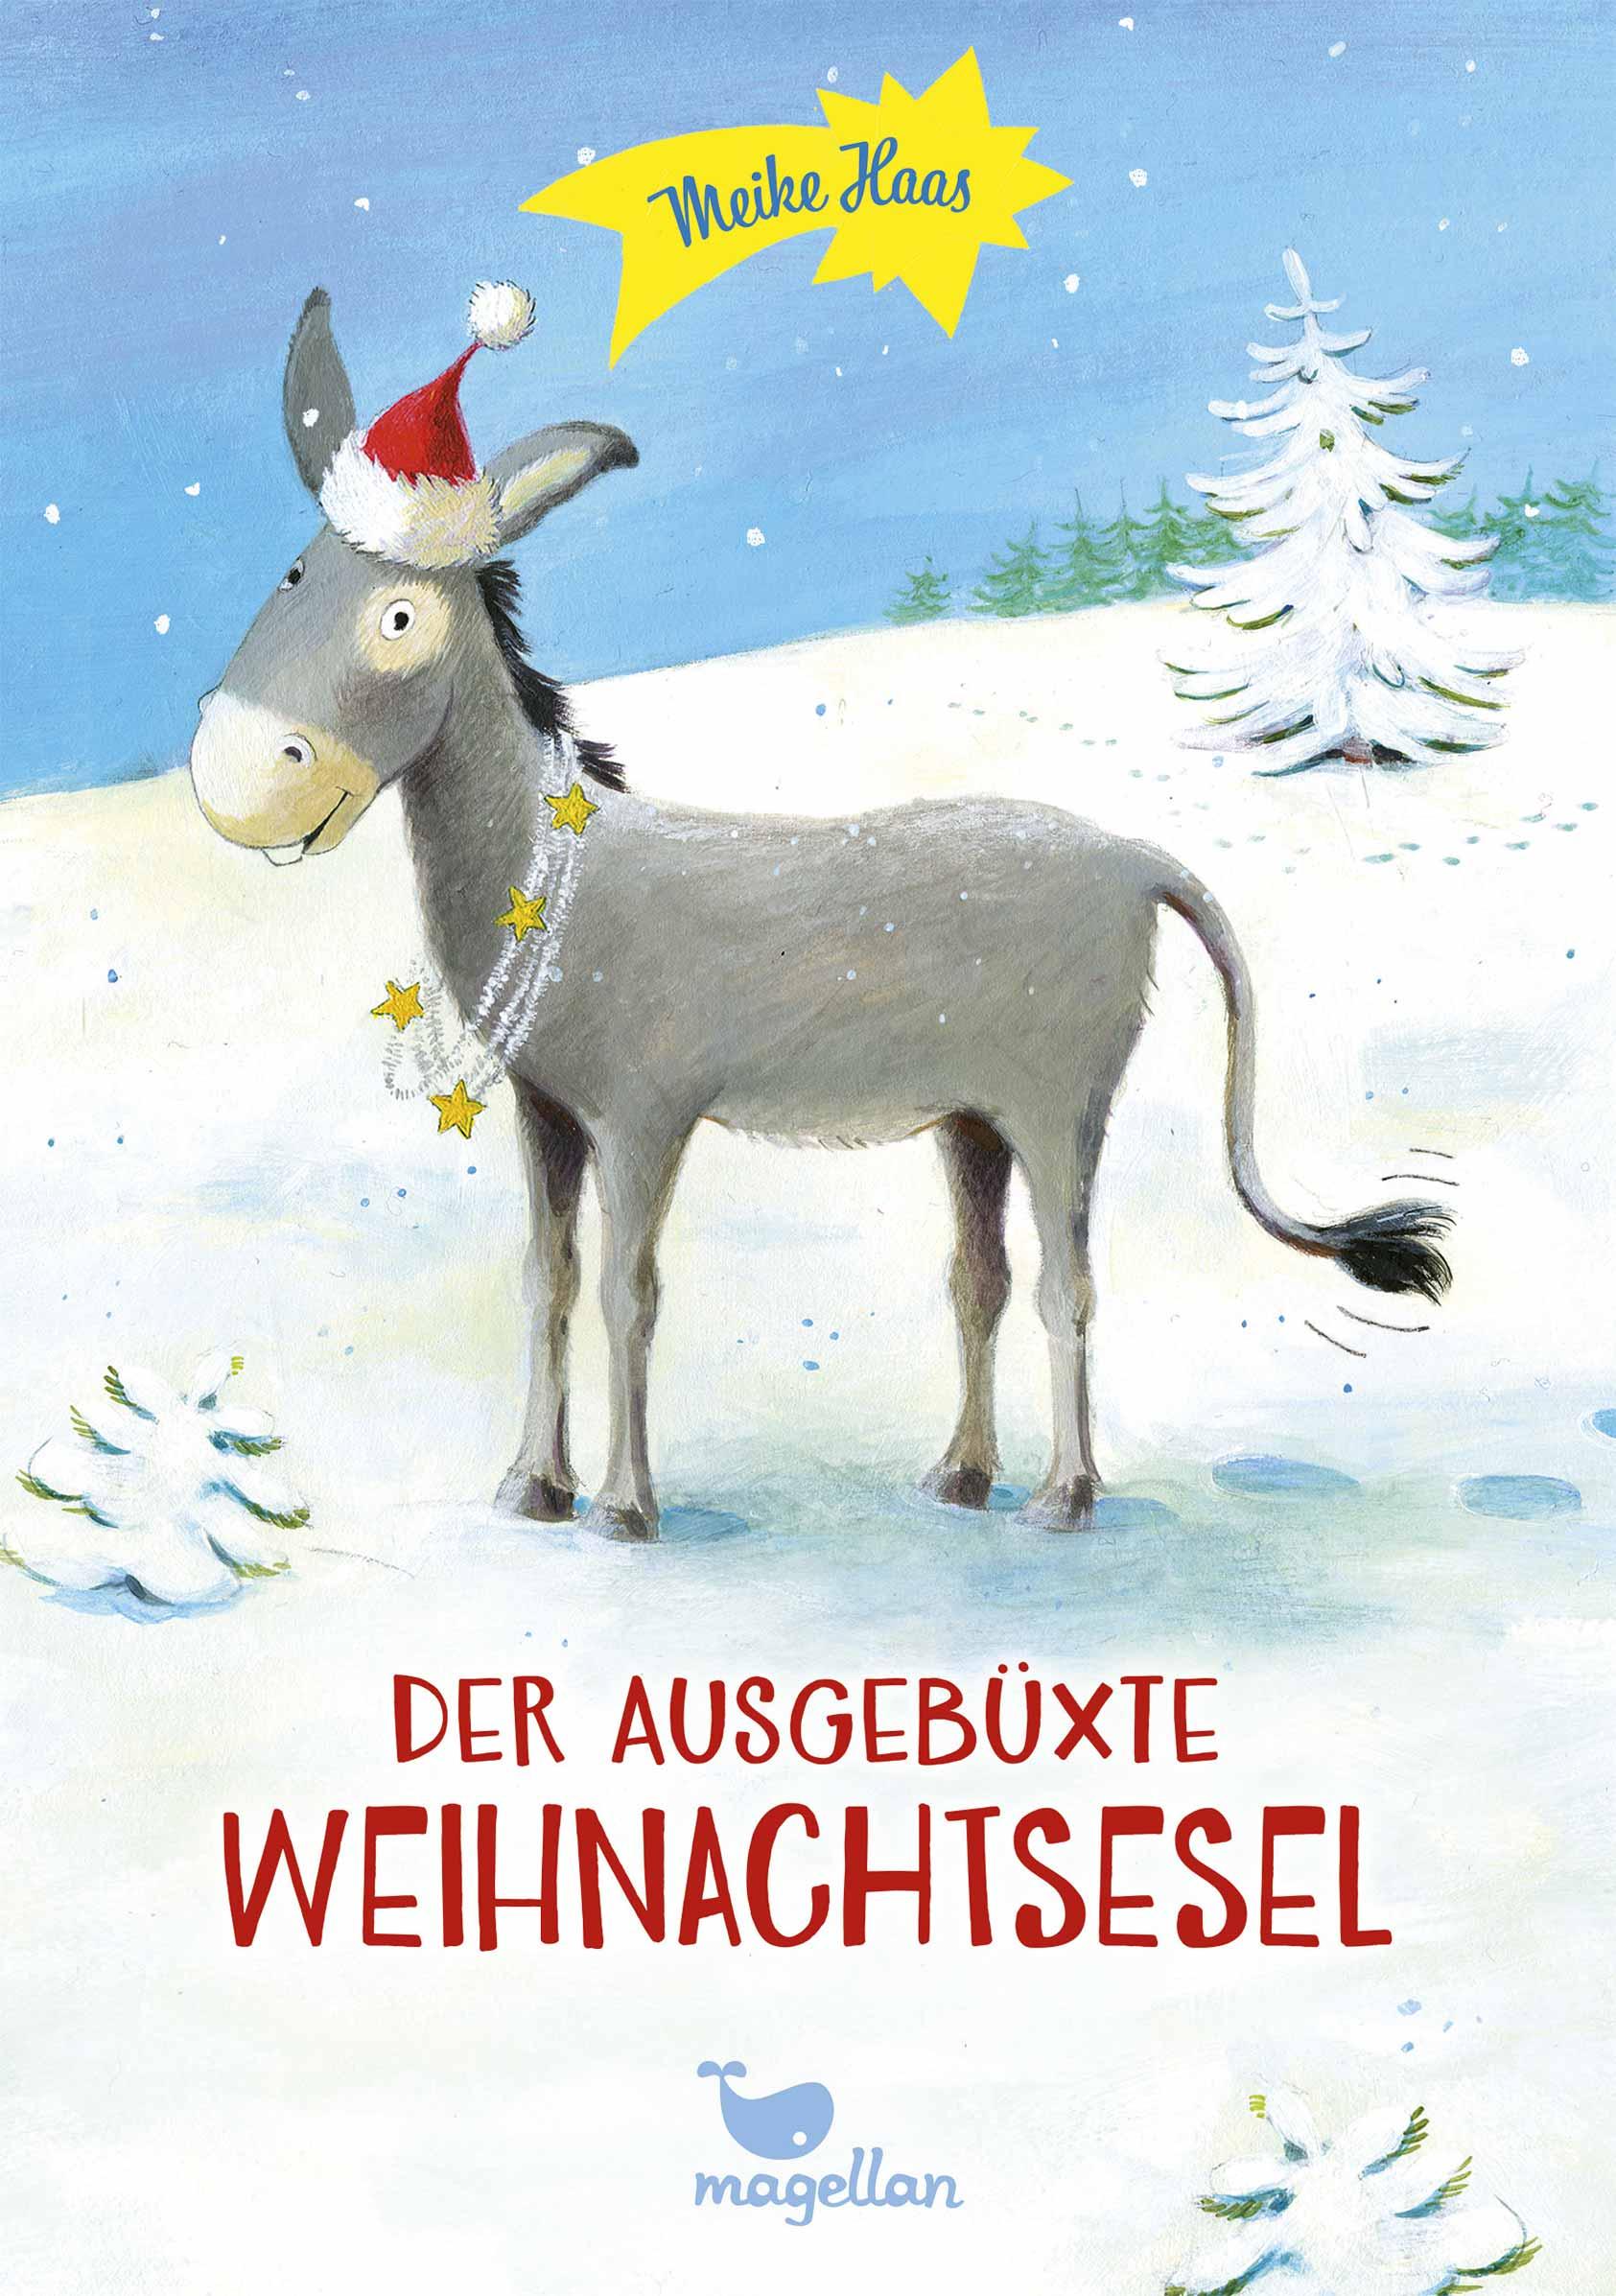 Happy Nikolaustag!